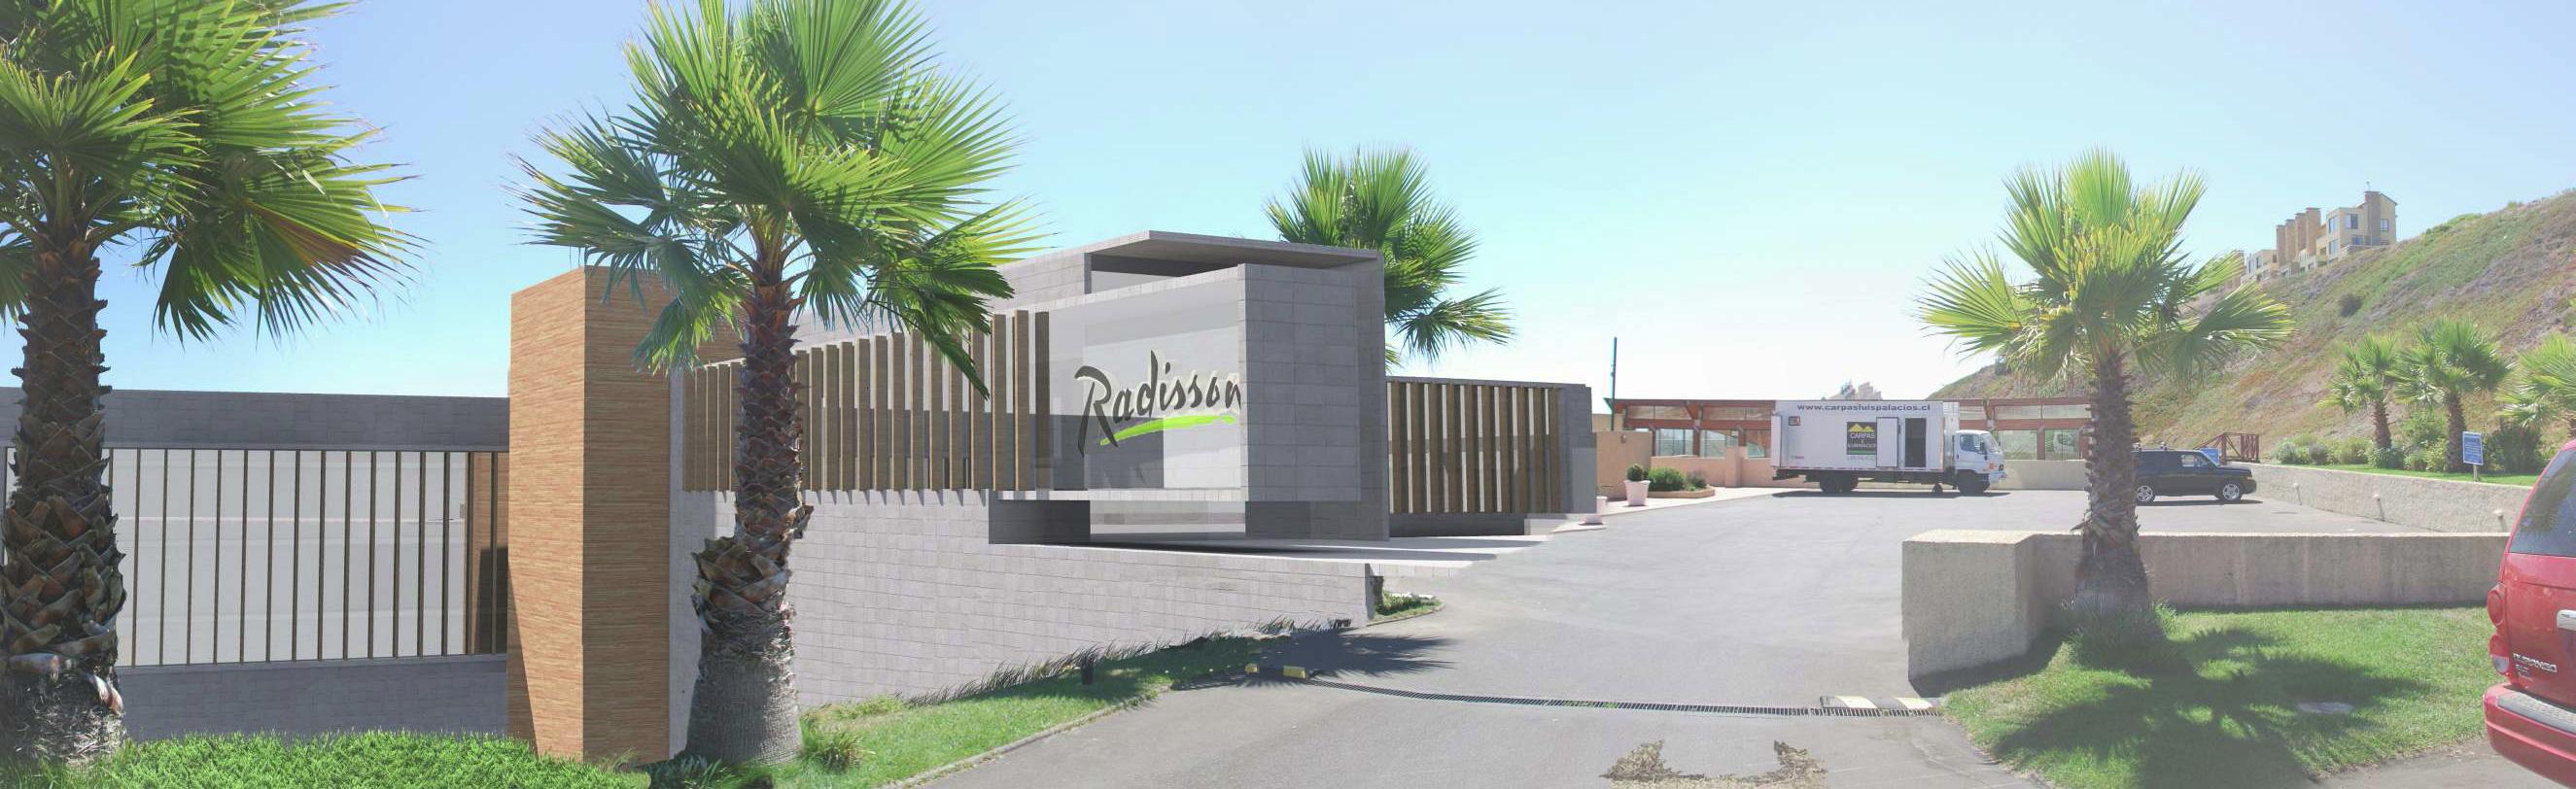 hotel-radisson3